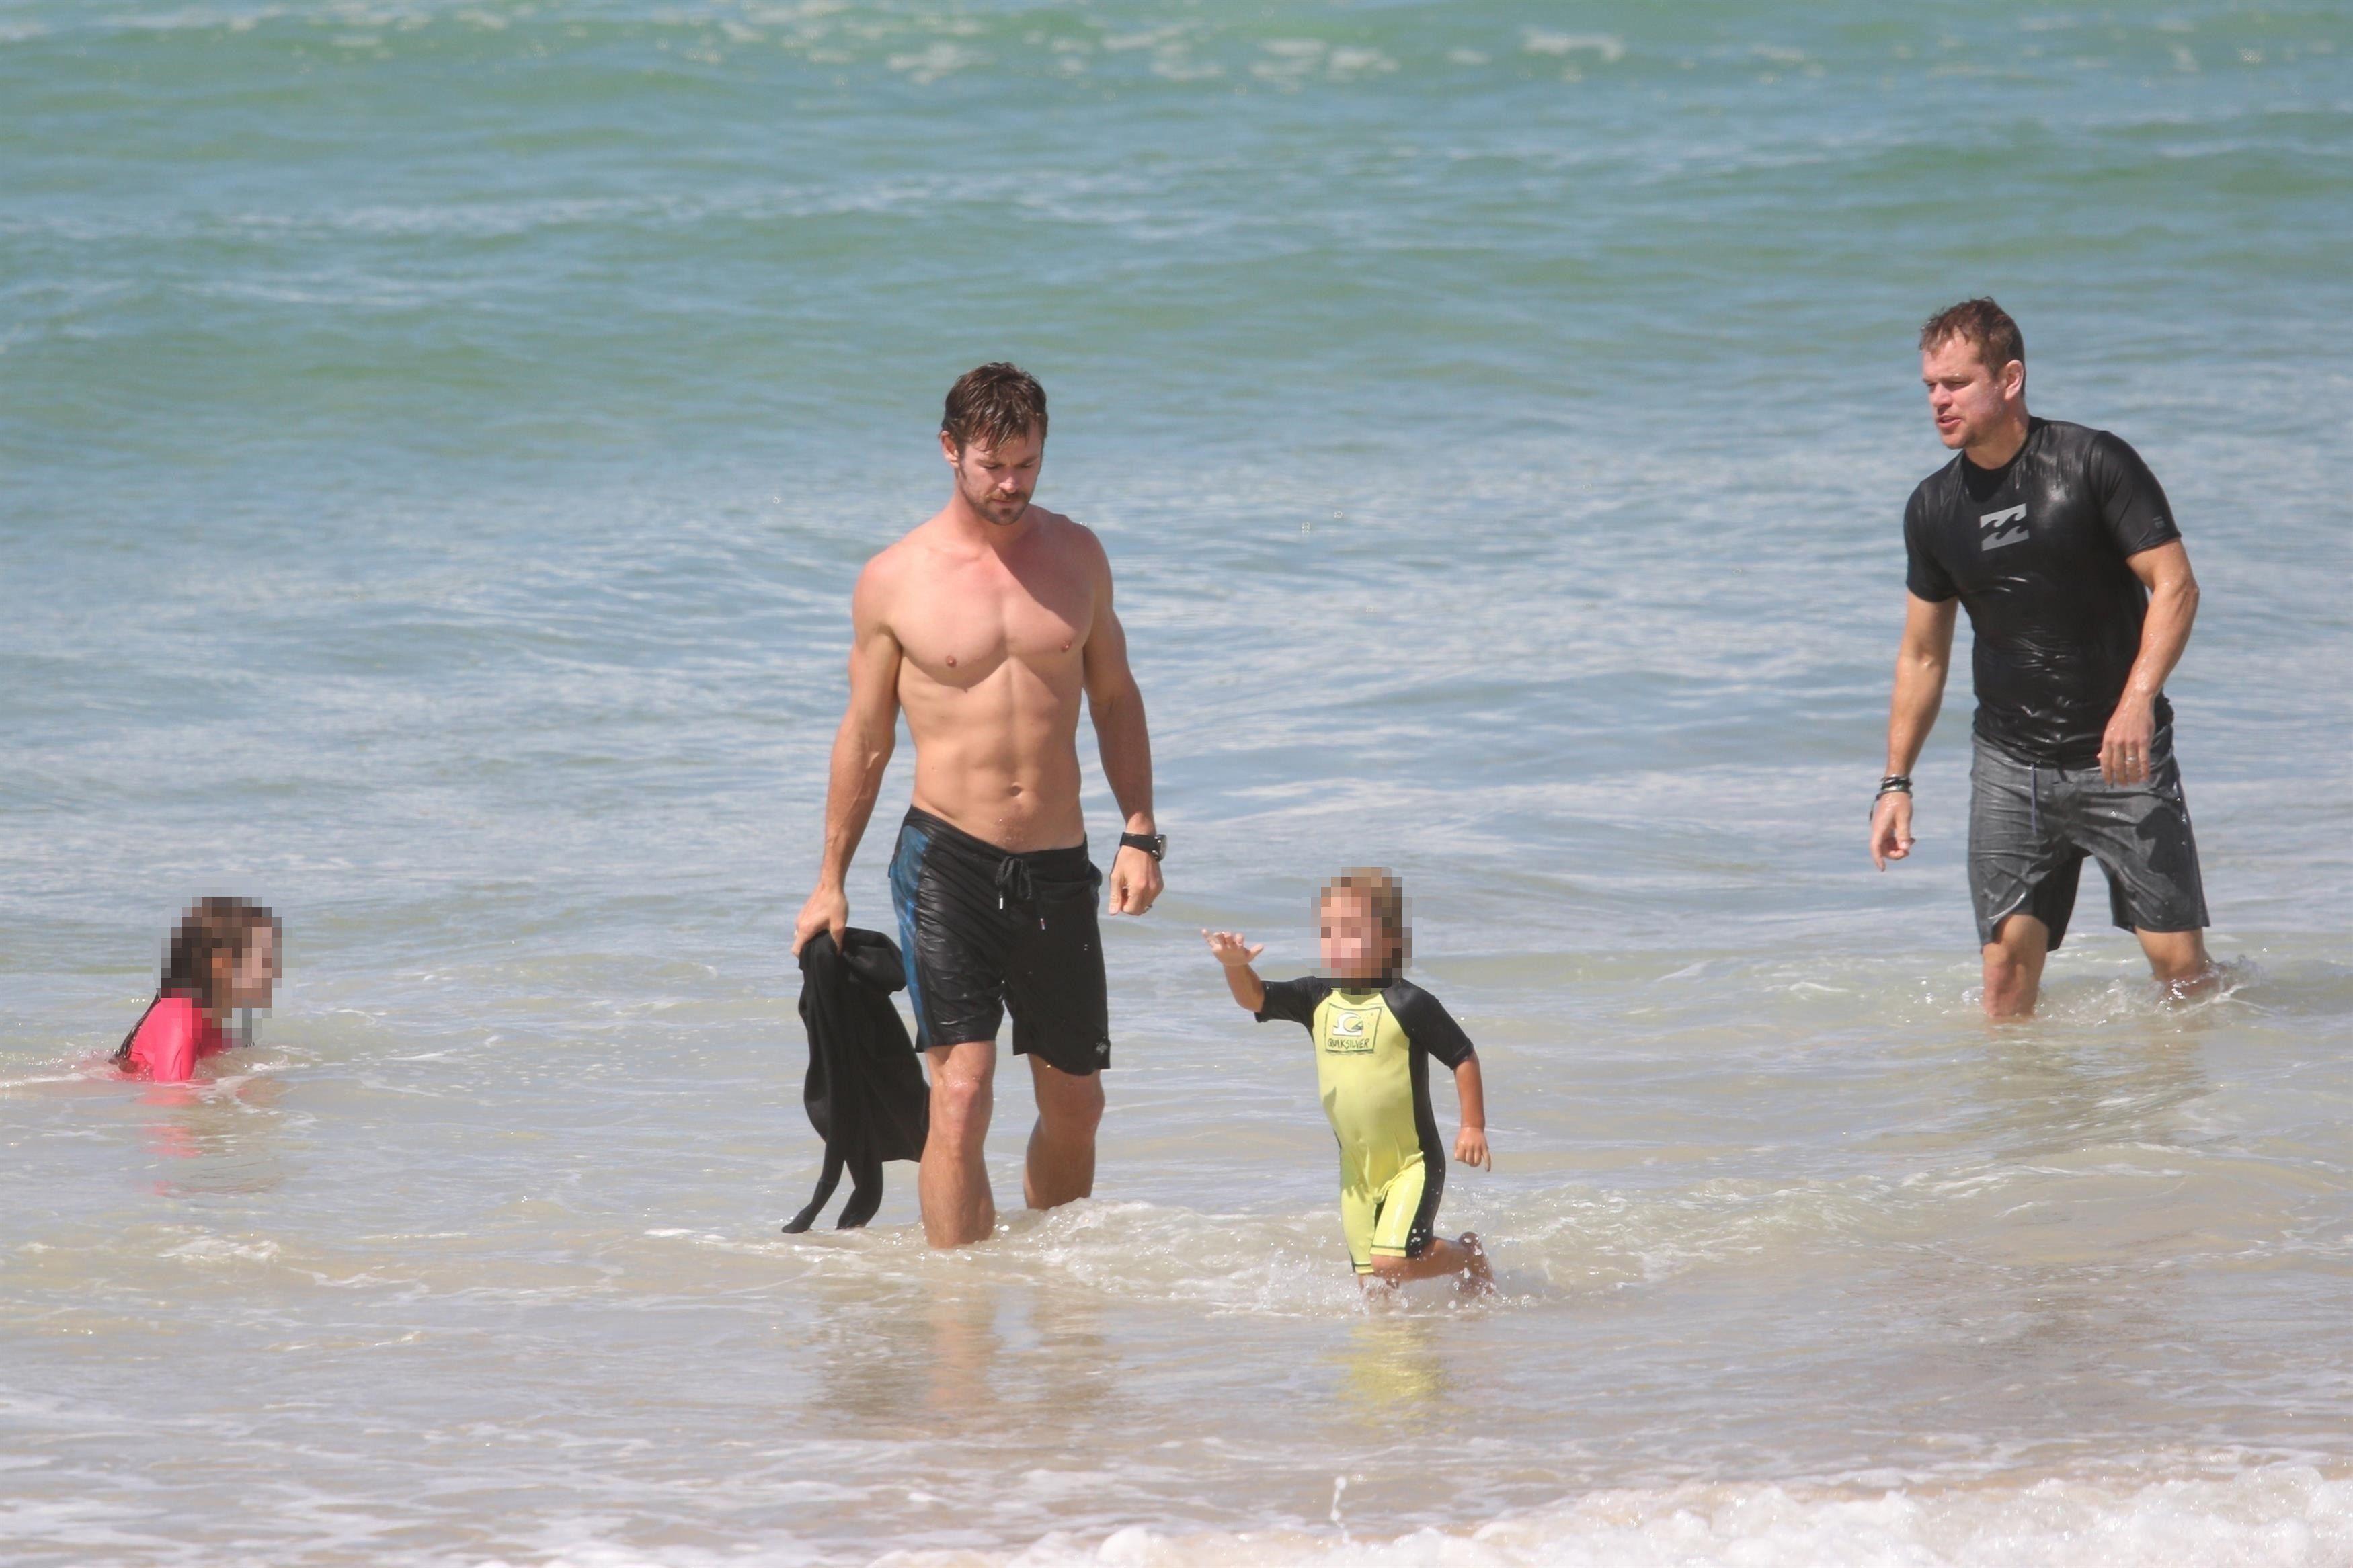 Chris Hemsworth And Matt Damon S Beach Vacation Was Better Than Yours